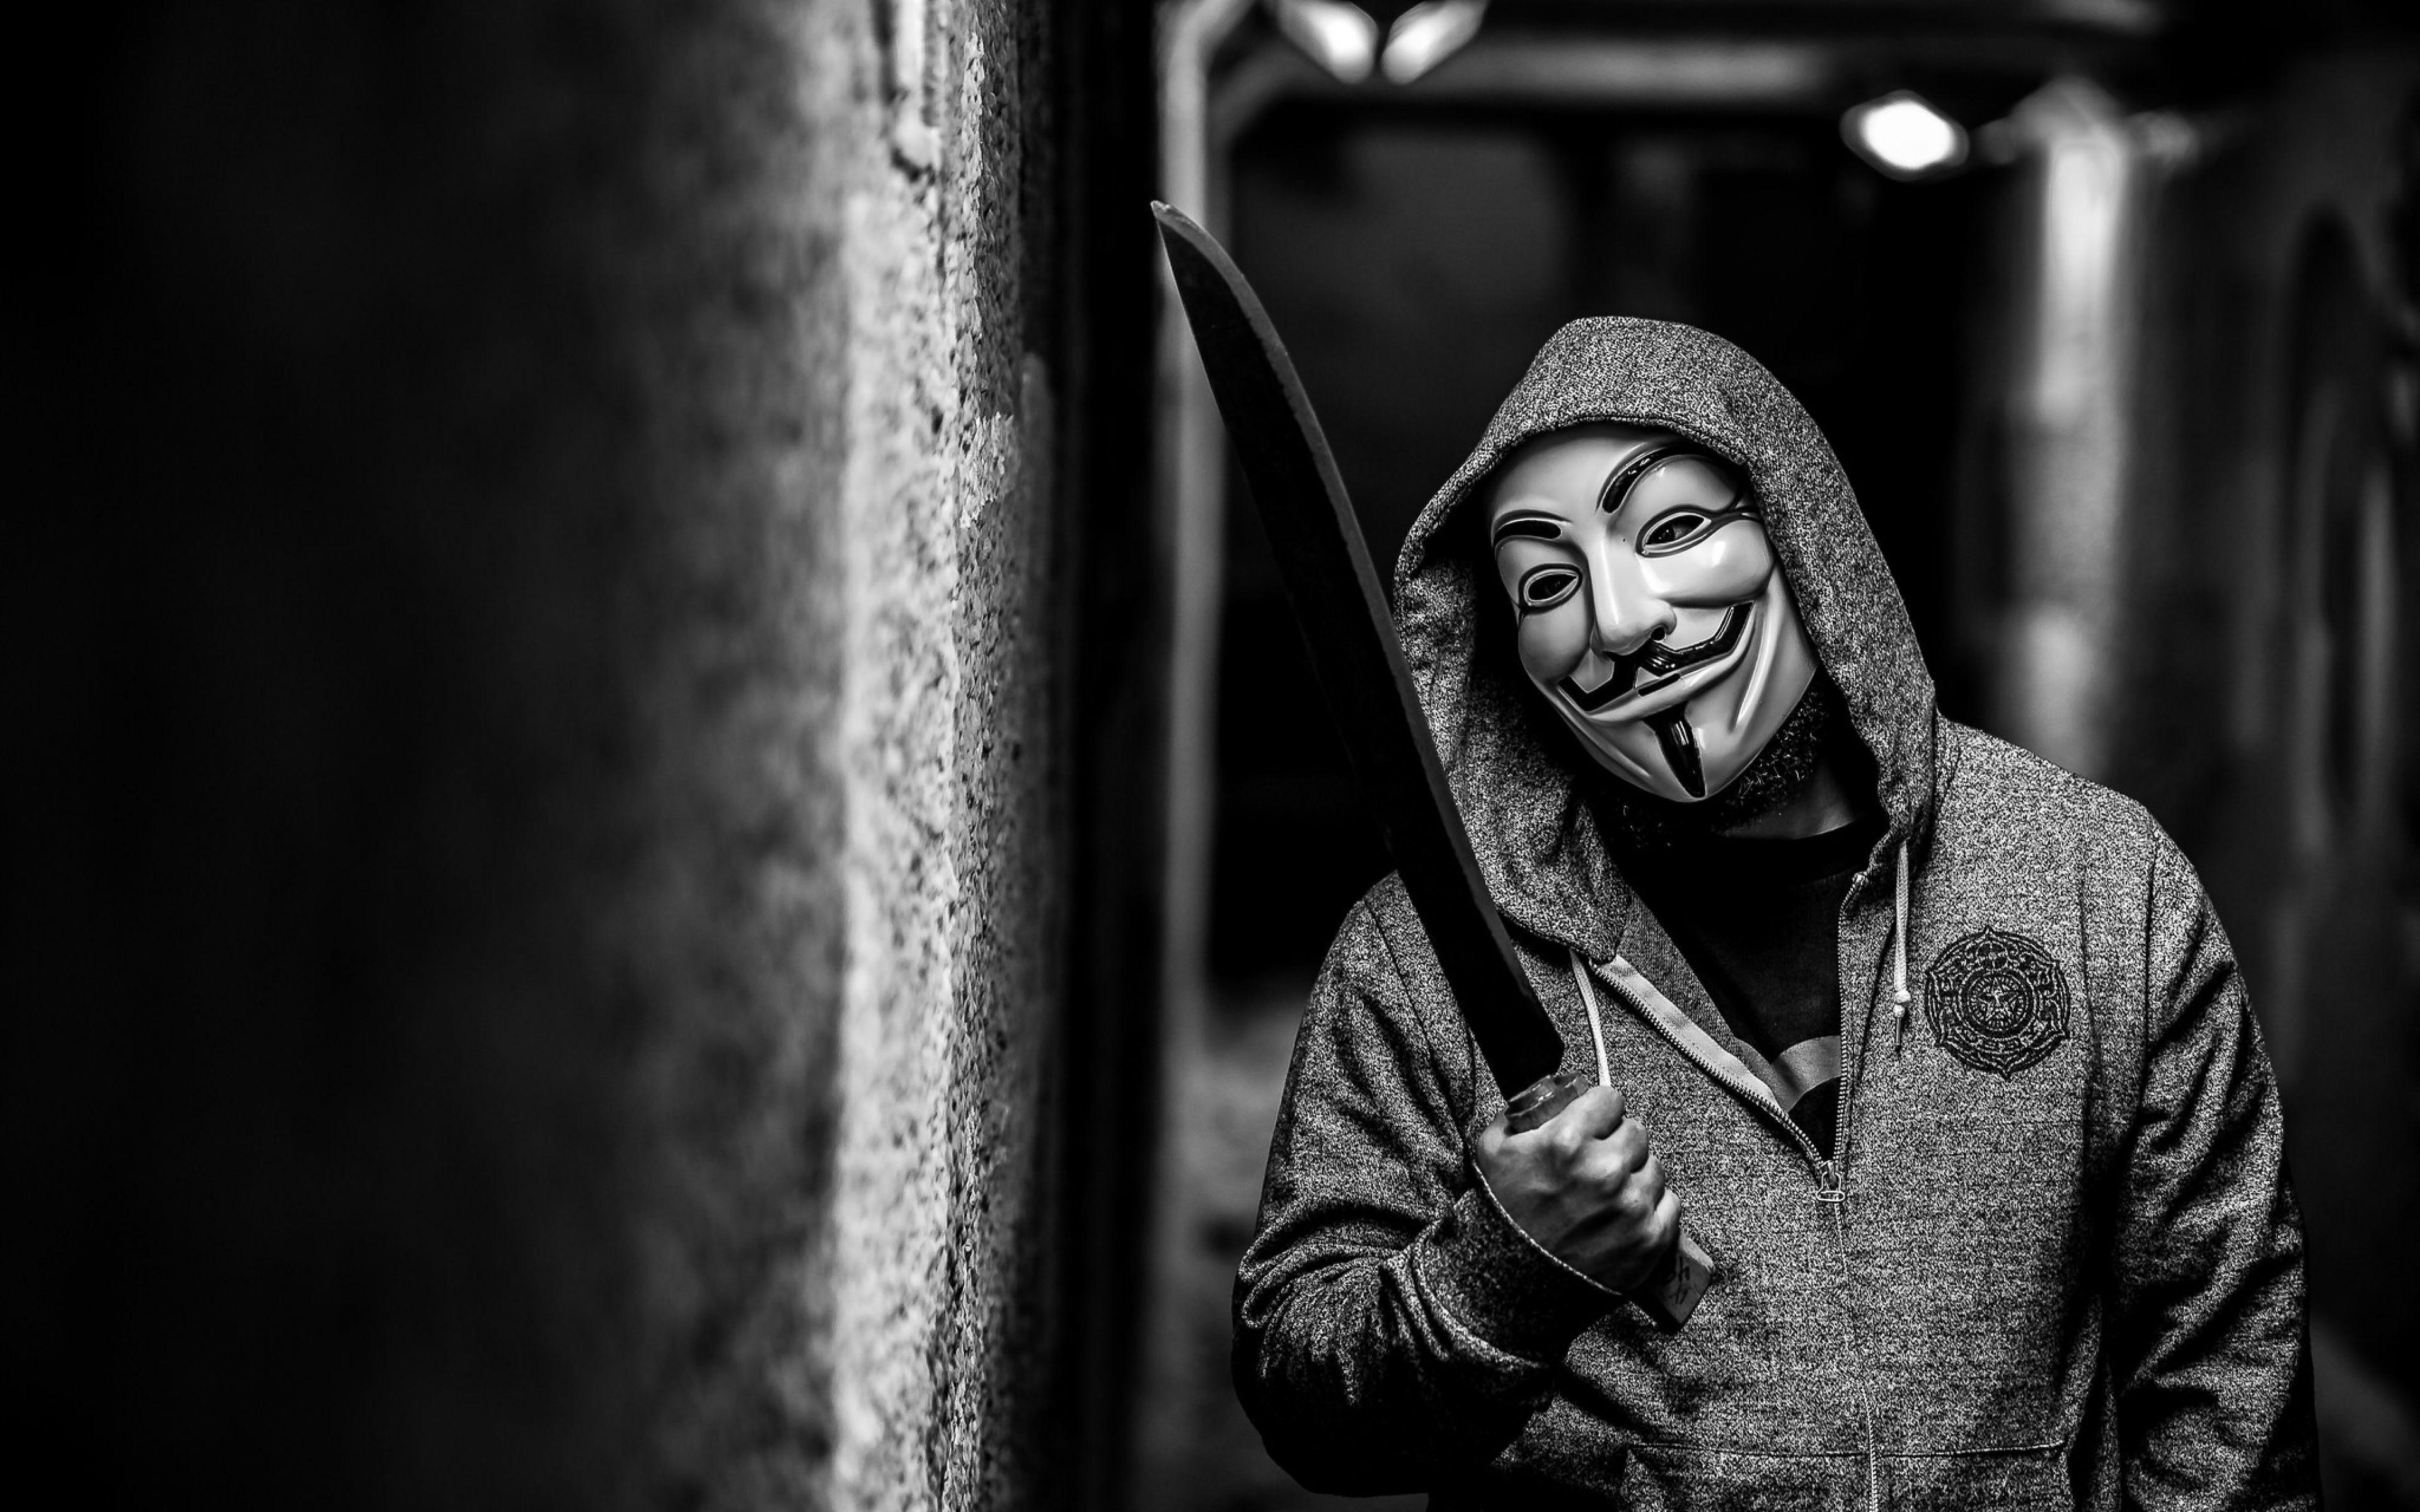 Hacker Mask Wallpapers Wallpaper Cave